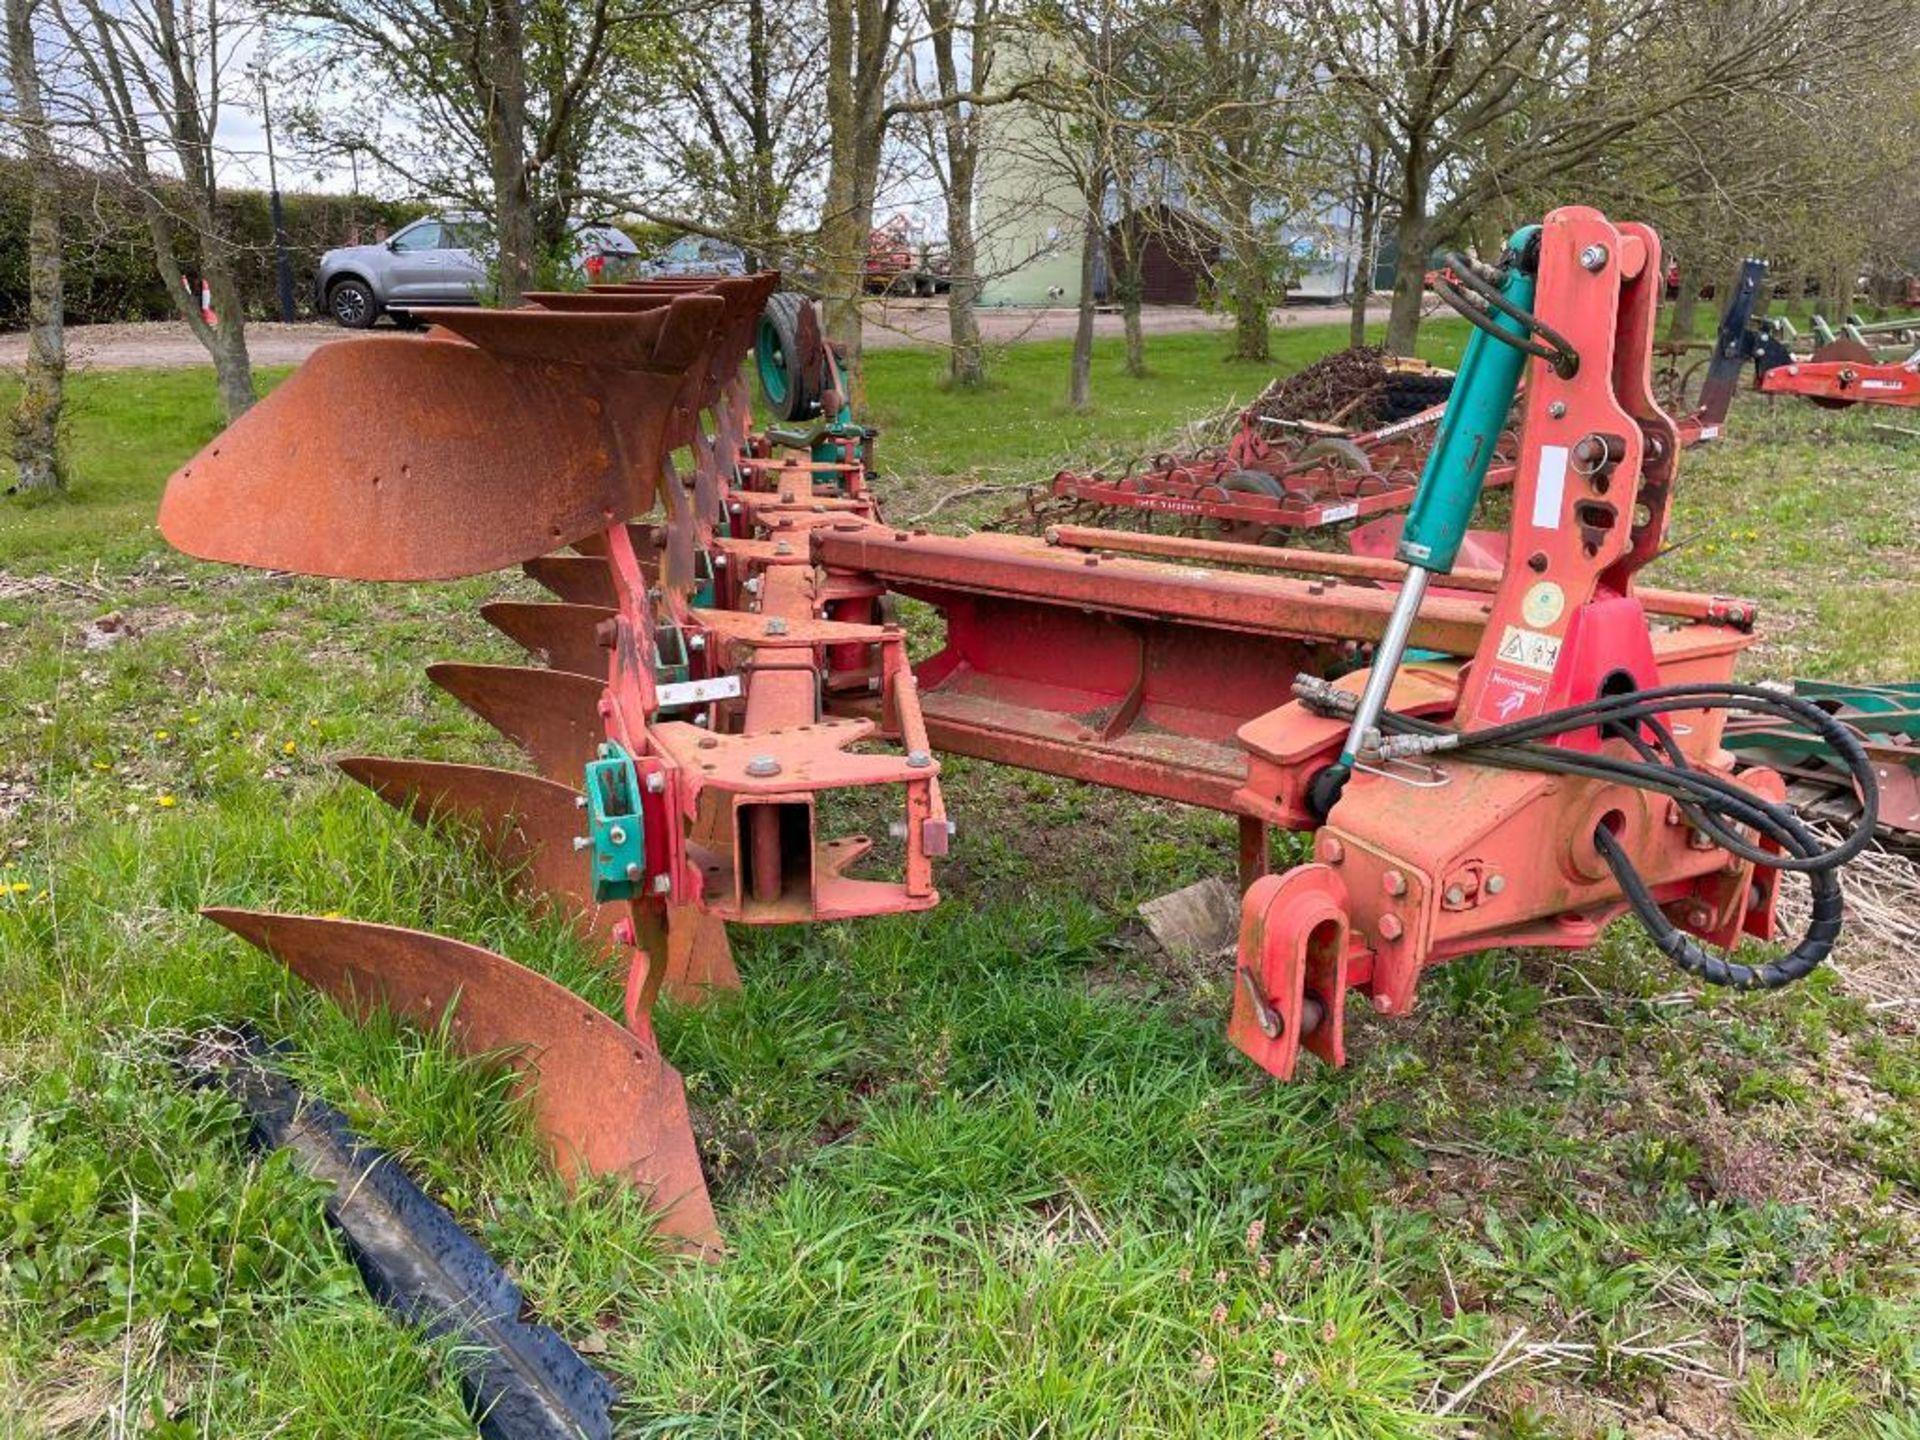 Kverneland 6+1f LO85 reversible plough, hydraulic vari-width. Model No: 85-300-28. Serial No: 240. N - Image 8 of 11